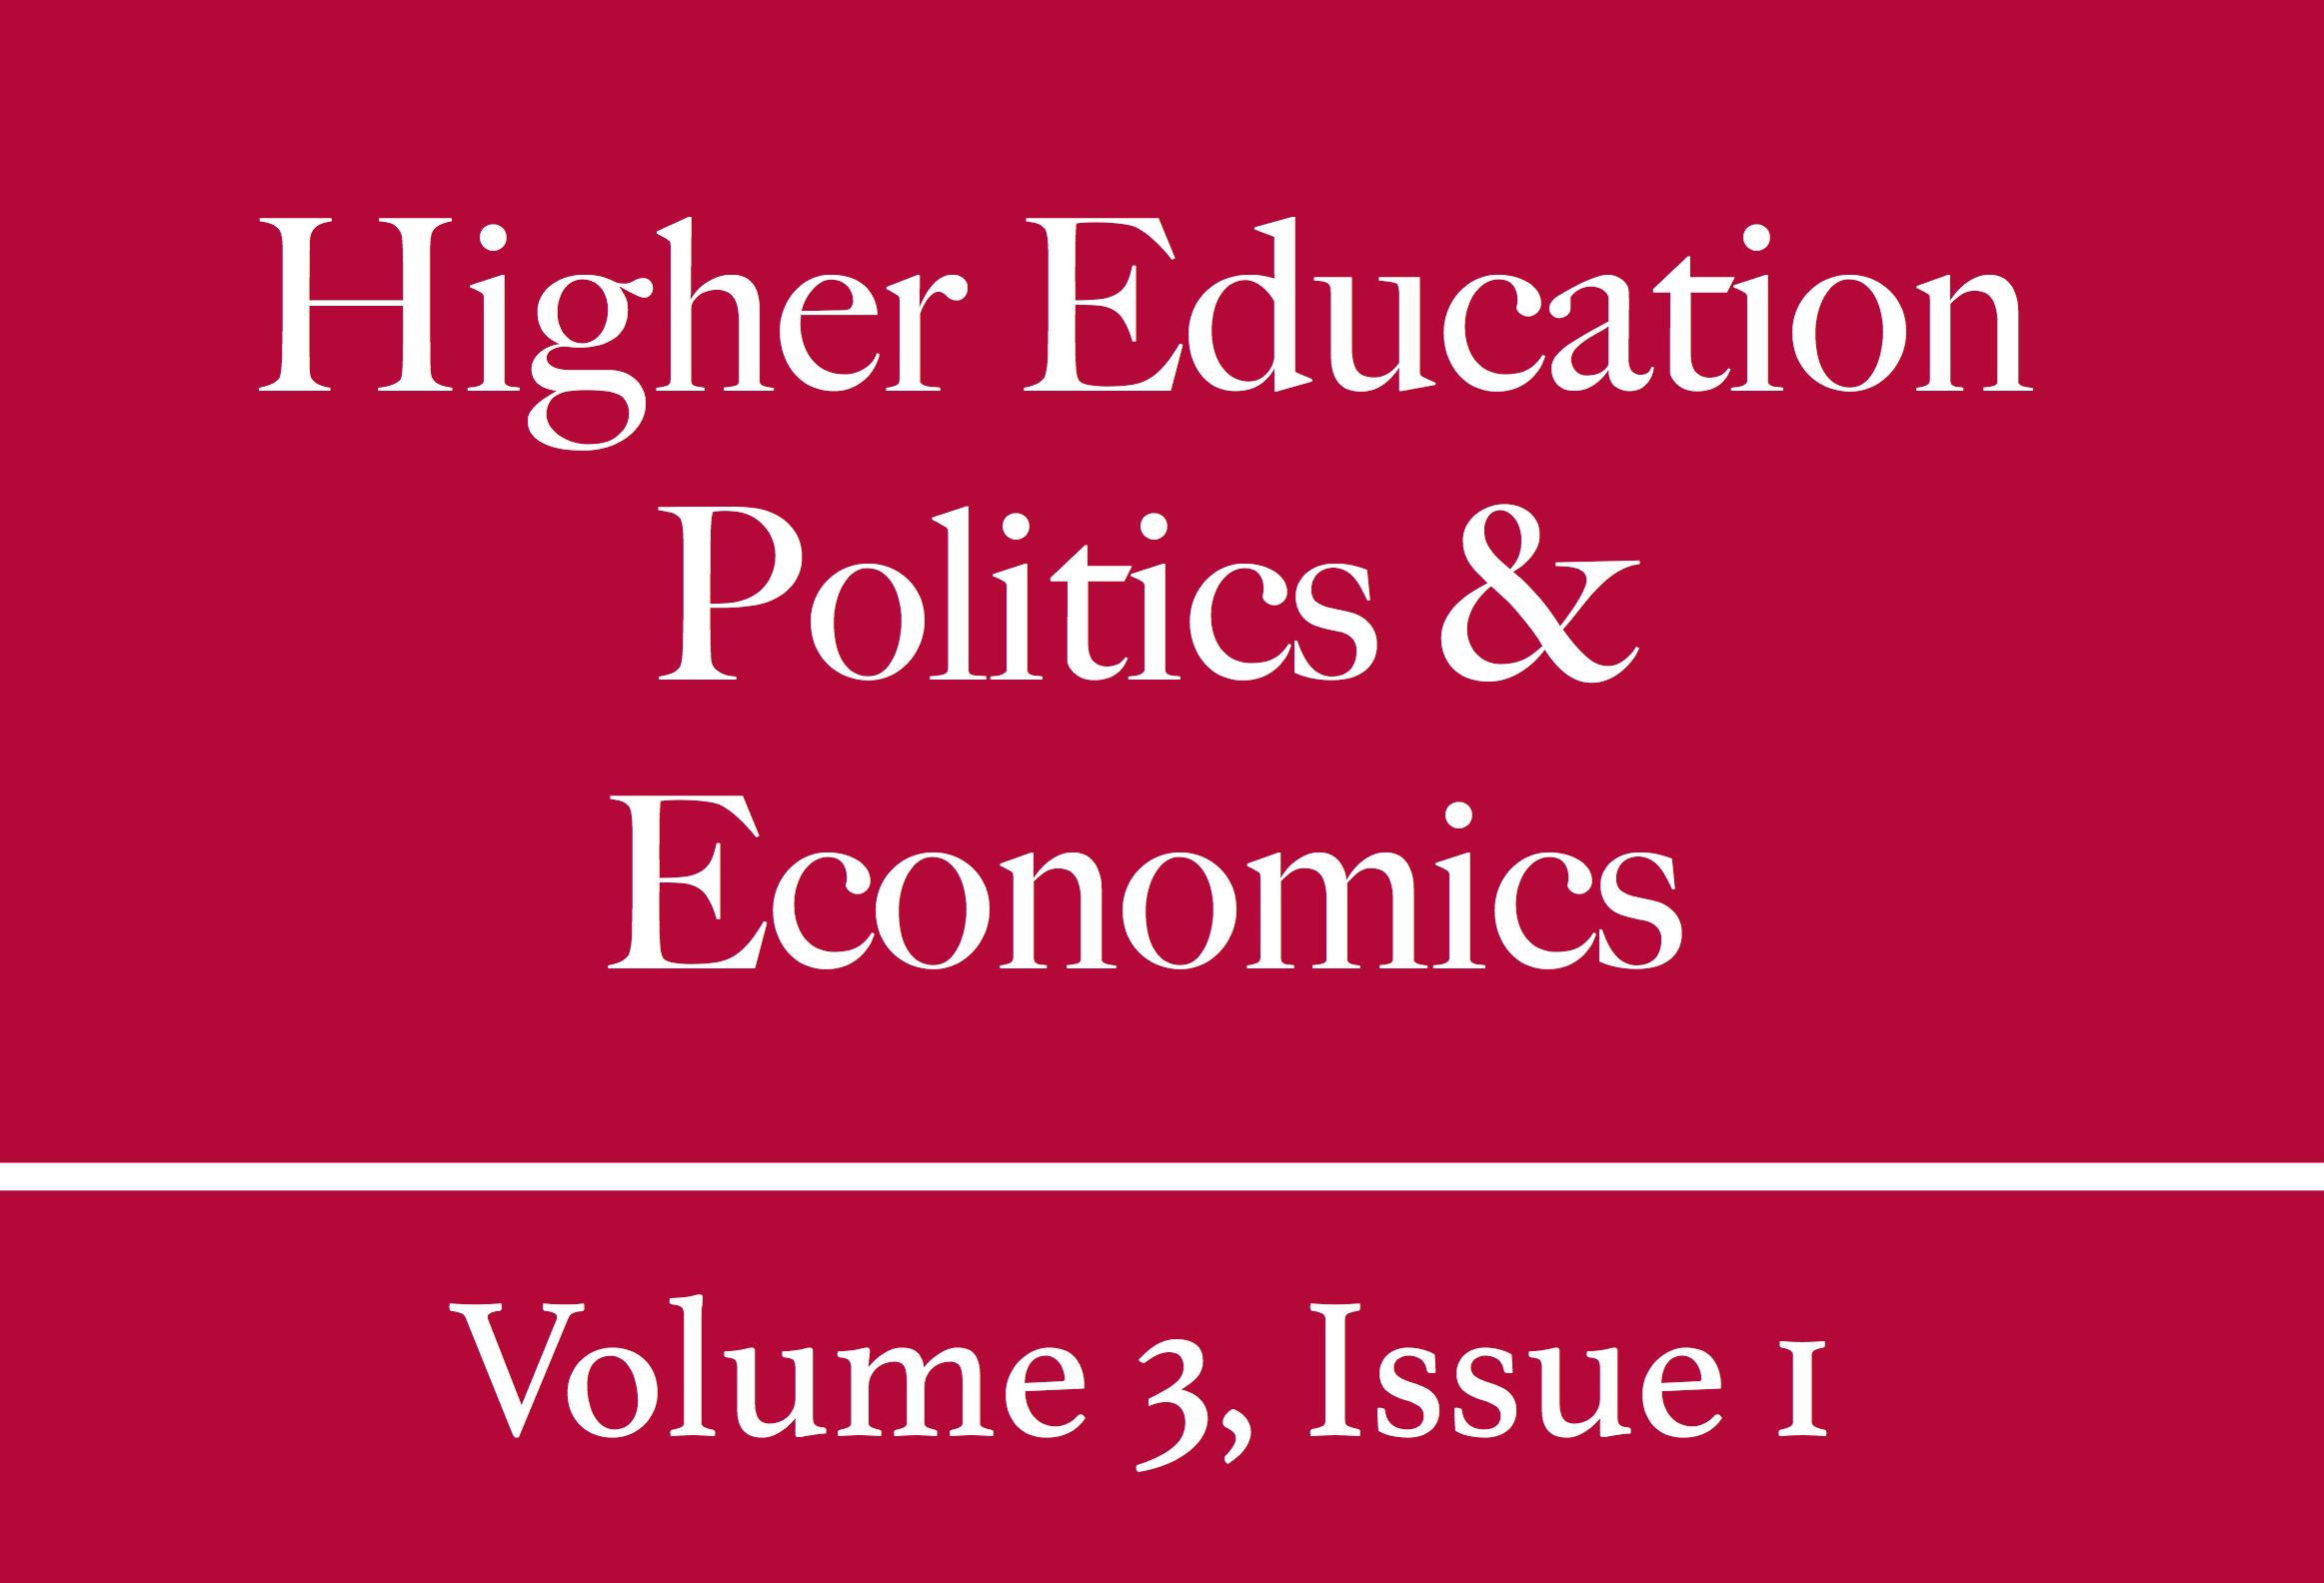 HEPE Volume 3, Issue 1